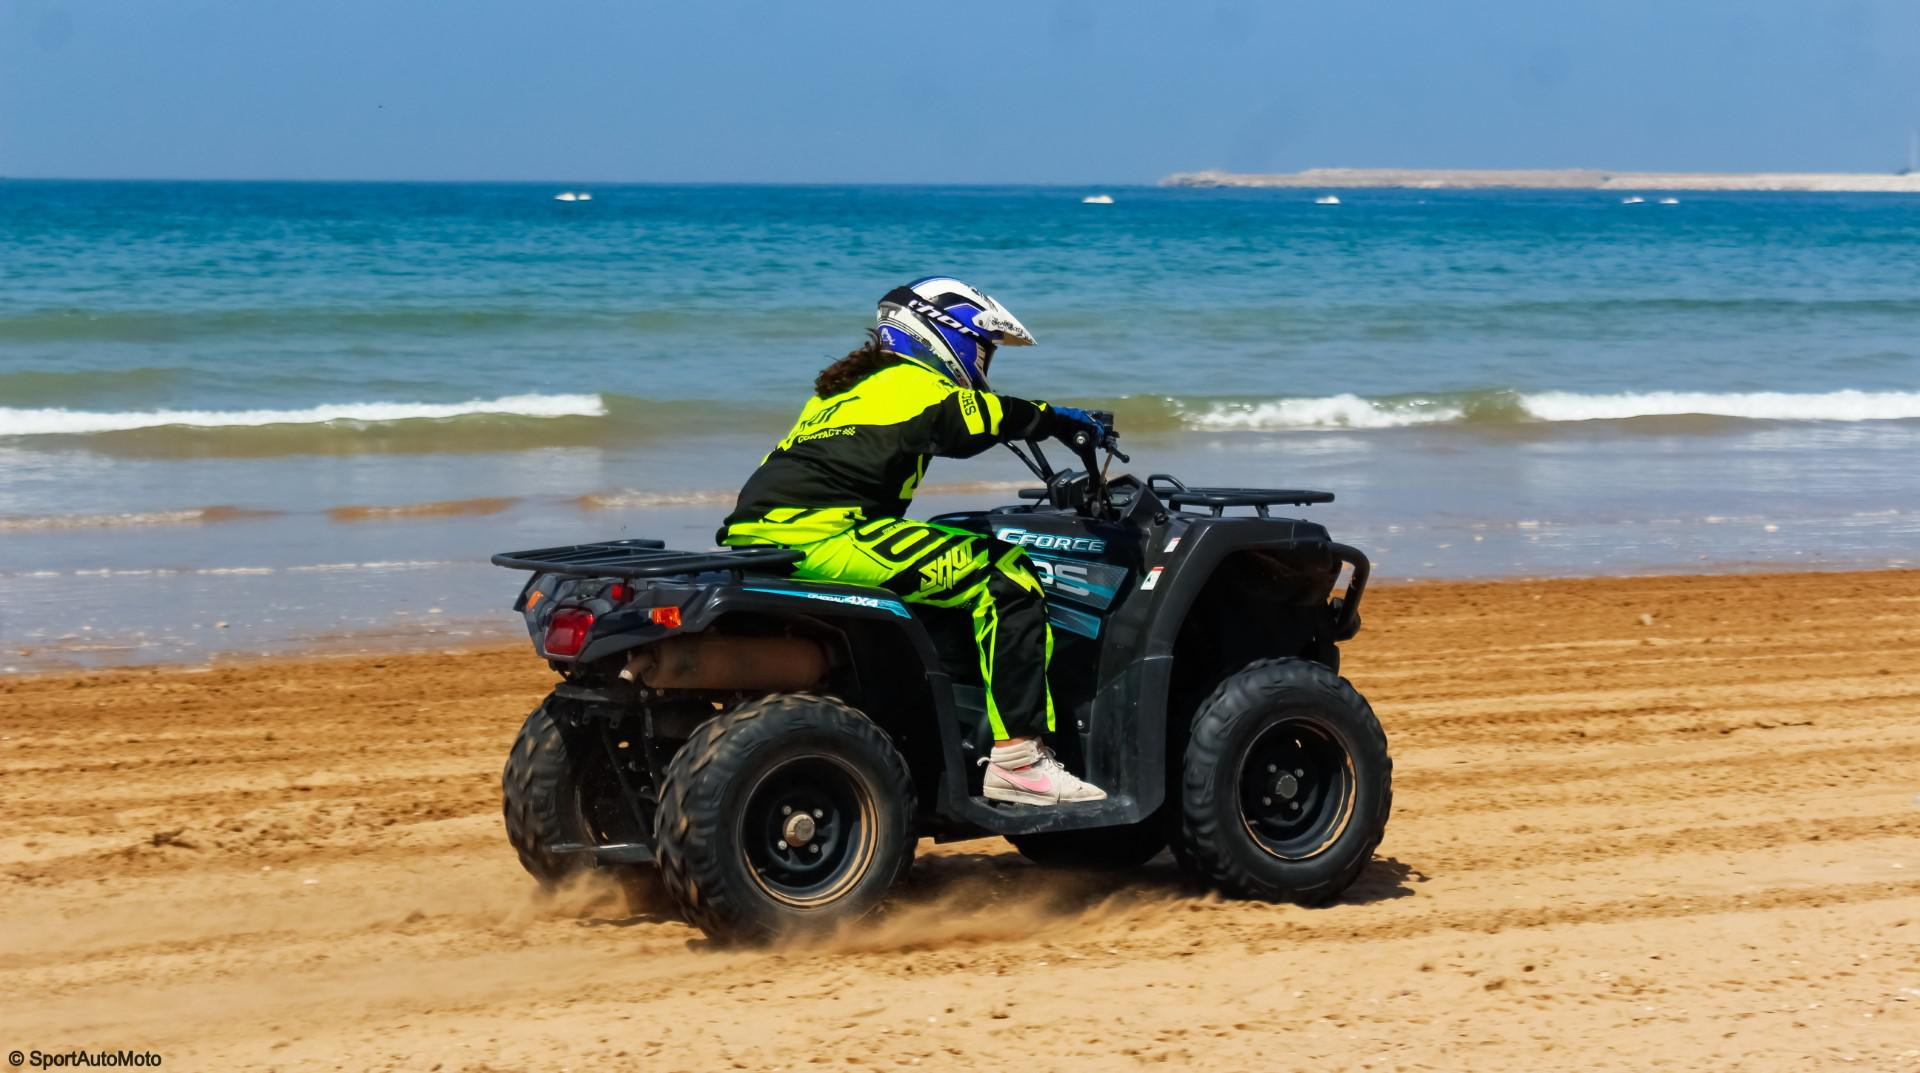 agadir-beach-race-la-reussite-791-17.jpg